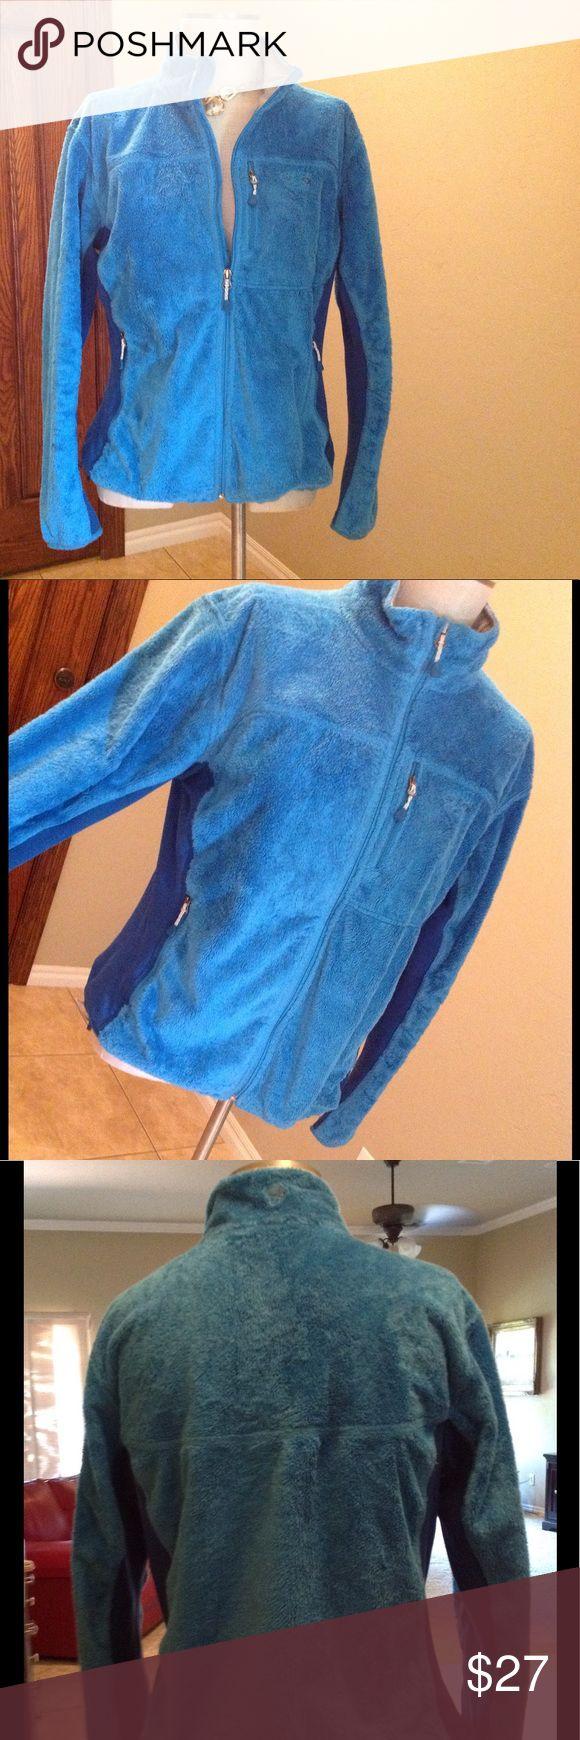 Mountain Hardwear jacket Gorgeous deep blue color!!!  supersoft and warm. Mountain Hardwear Jackets & Coats